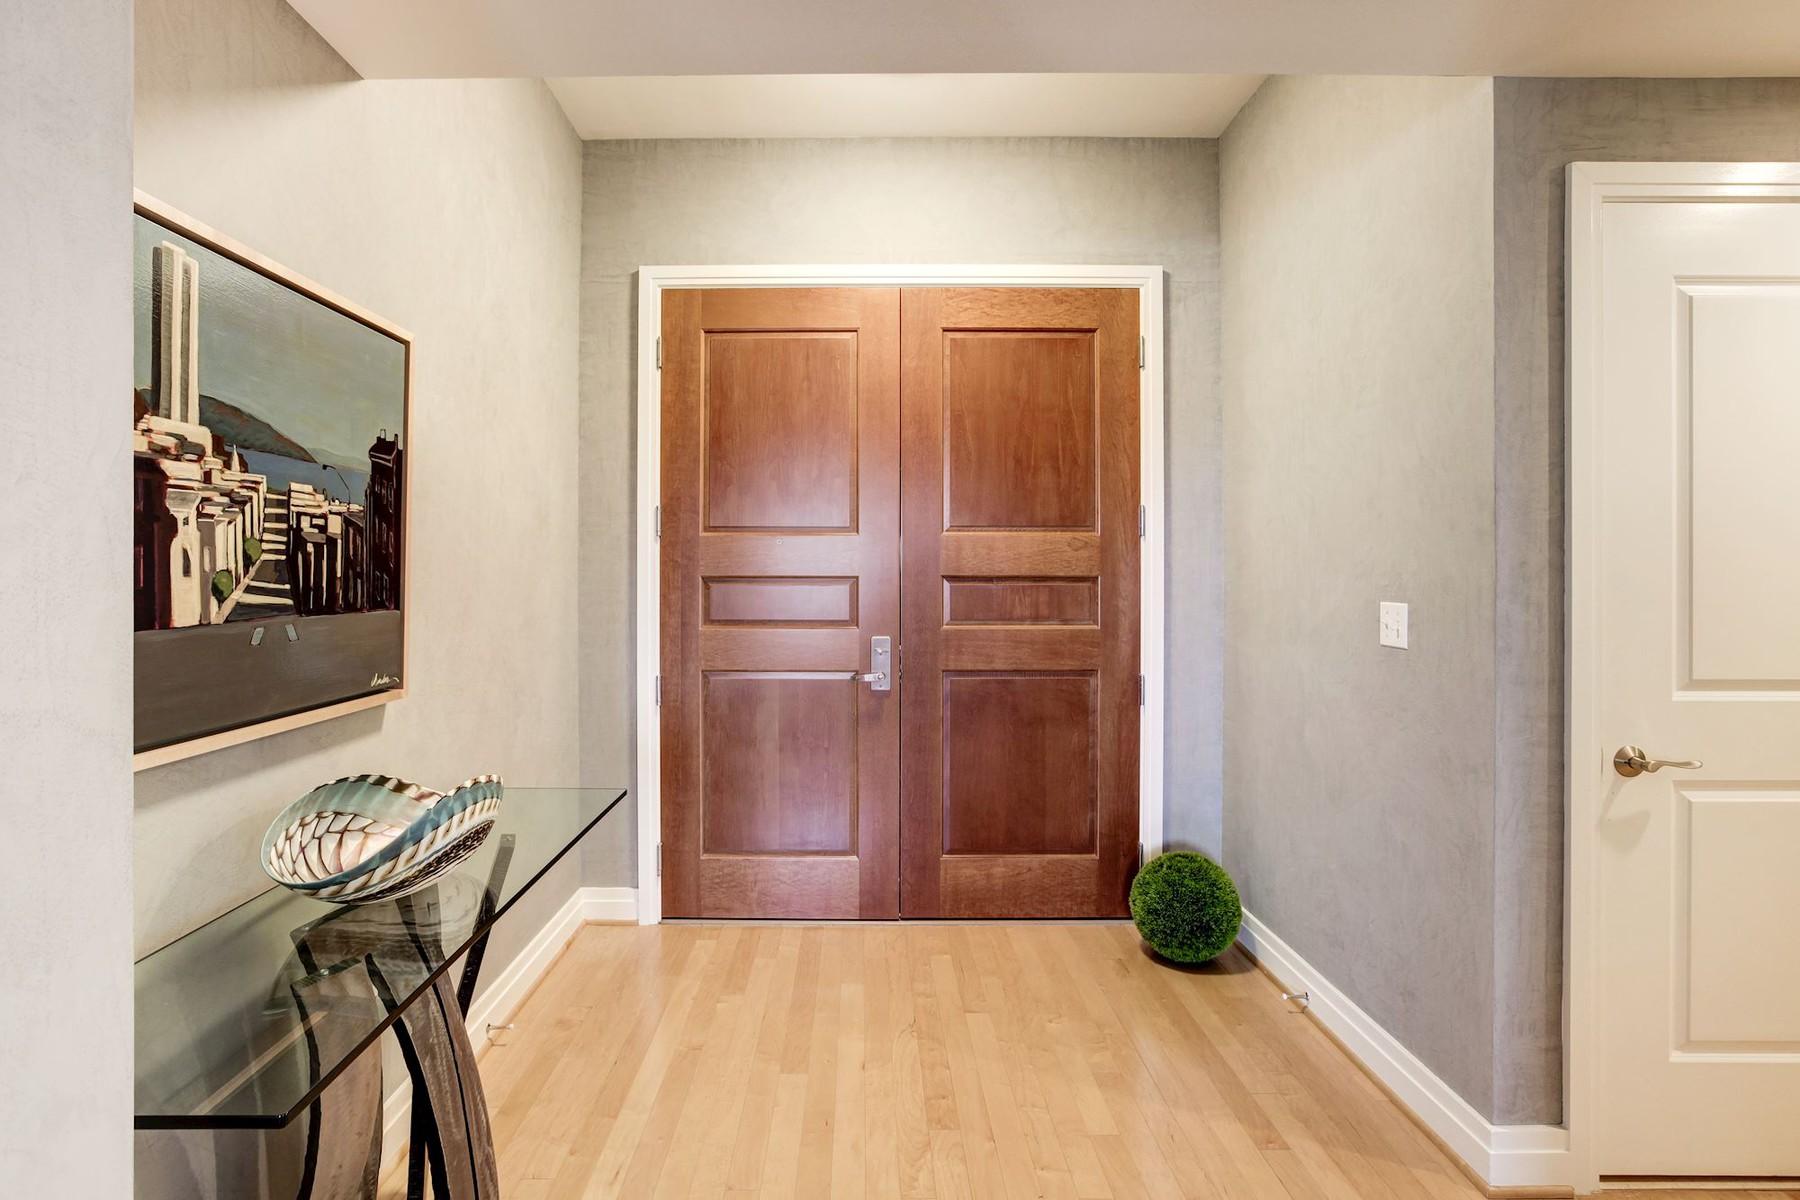 共管物業 為 出售 在 One Park Crest Condo 8220 Crestwood Heights Dr 1802 McLean, 弗吉尼亞州, 22102 美國